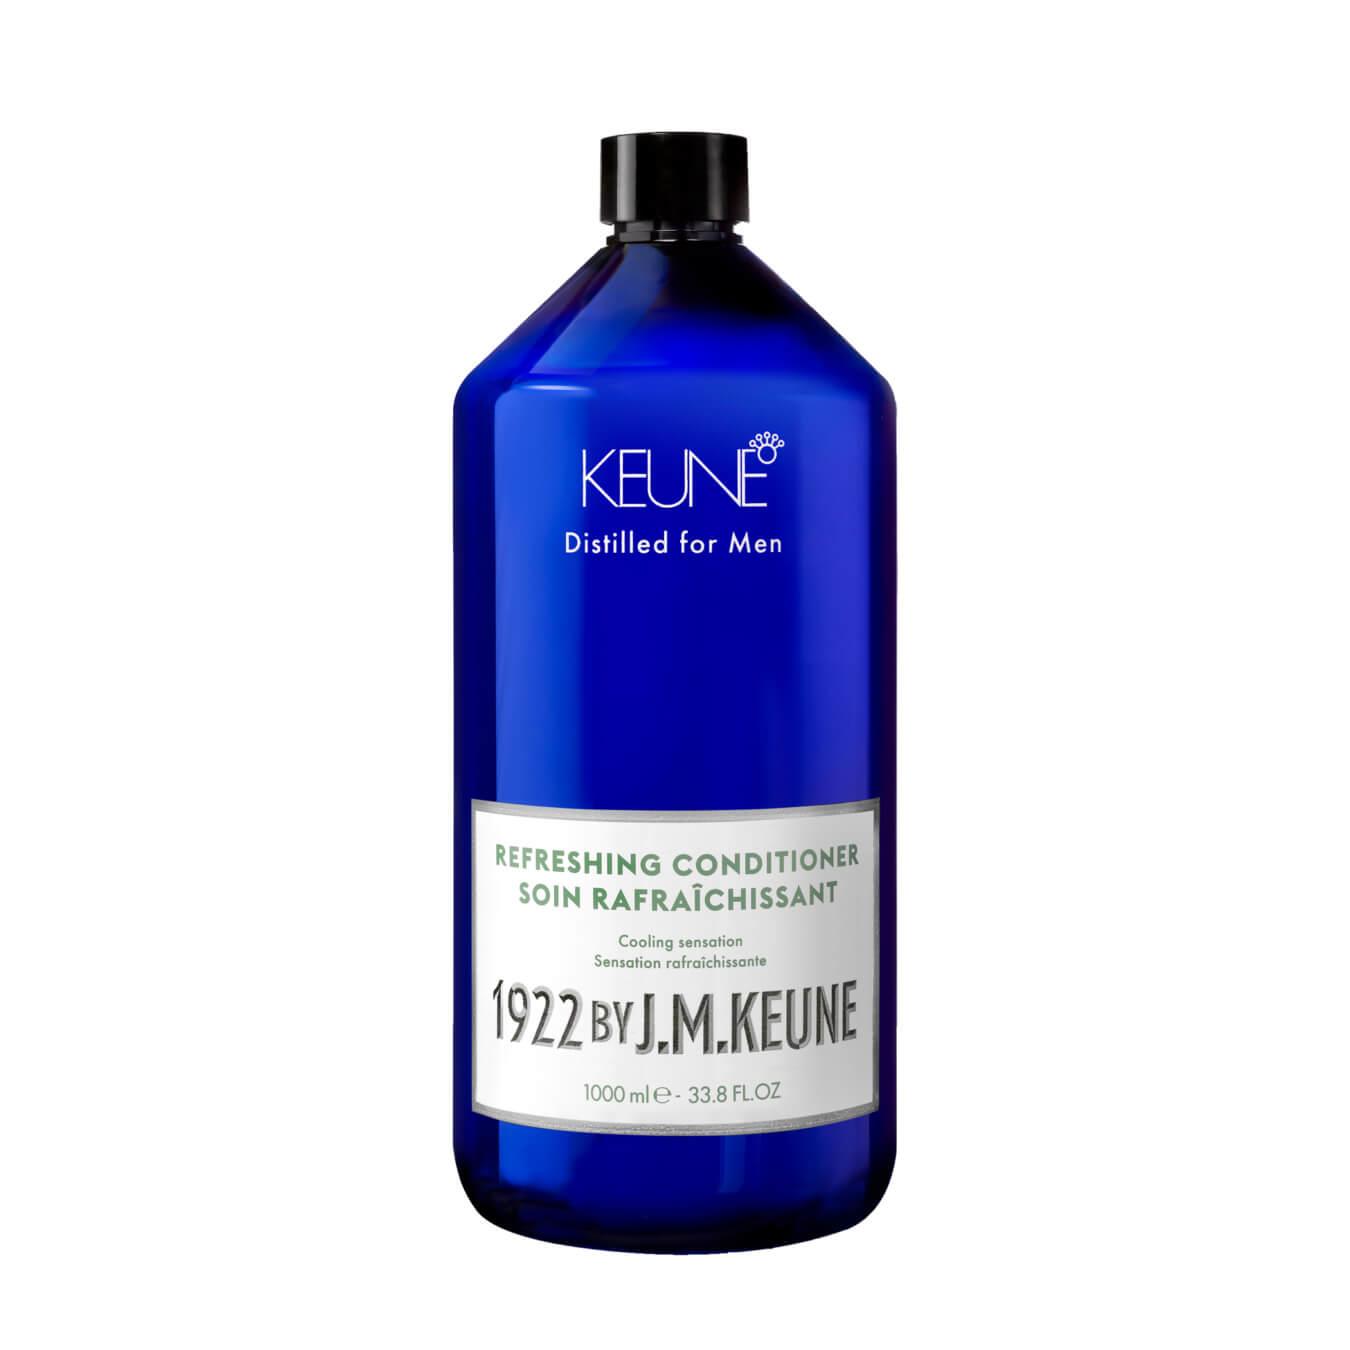 Kauf 1922 By JM Keune Refreshing Conditioner 1000ml